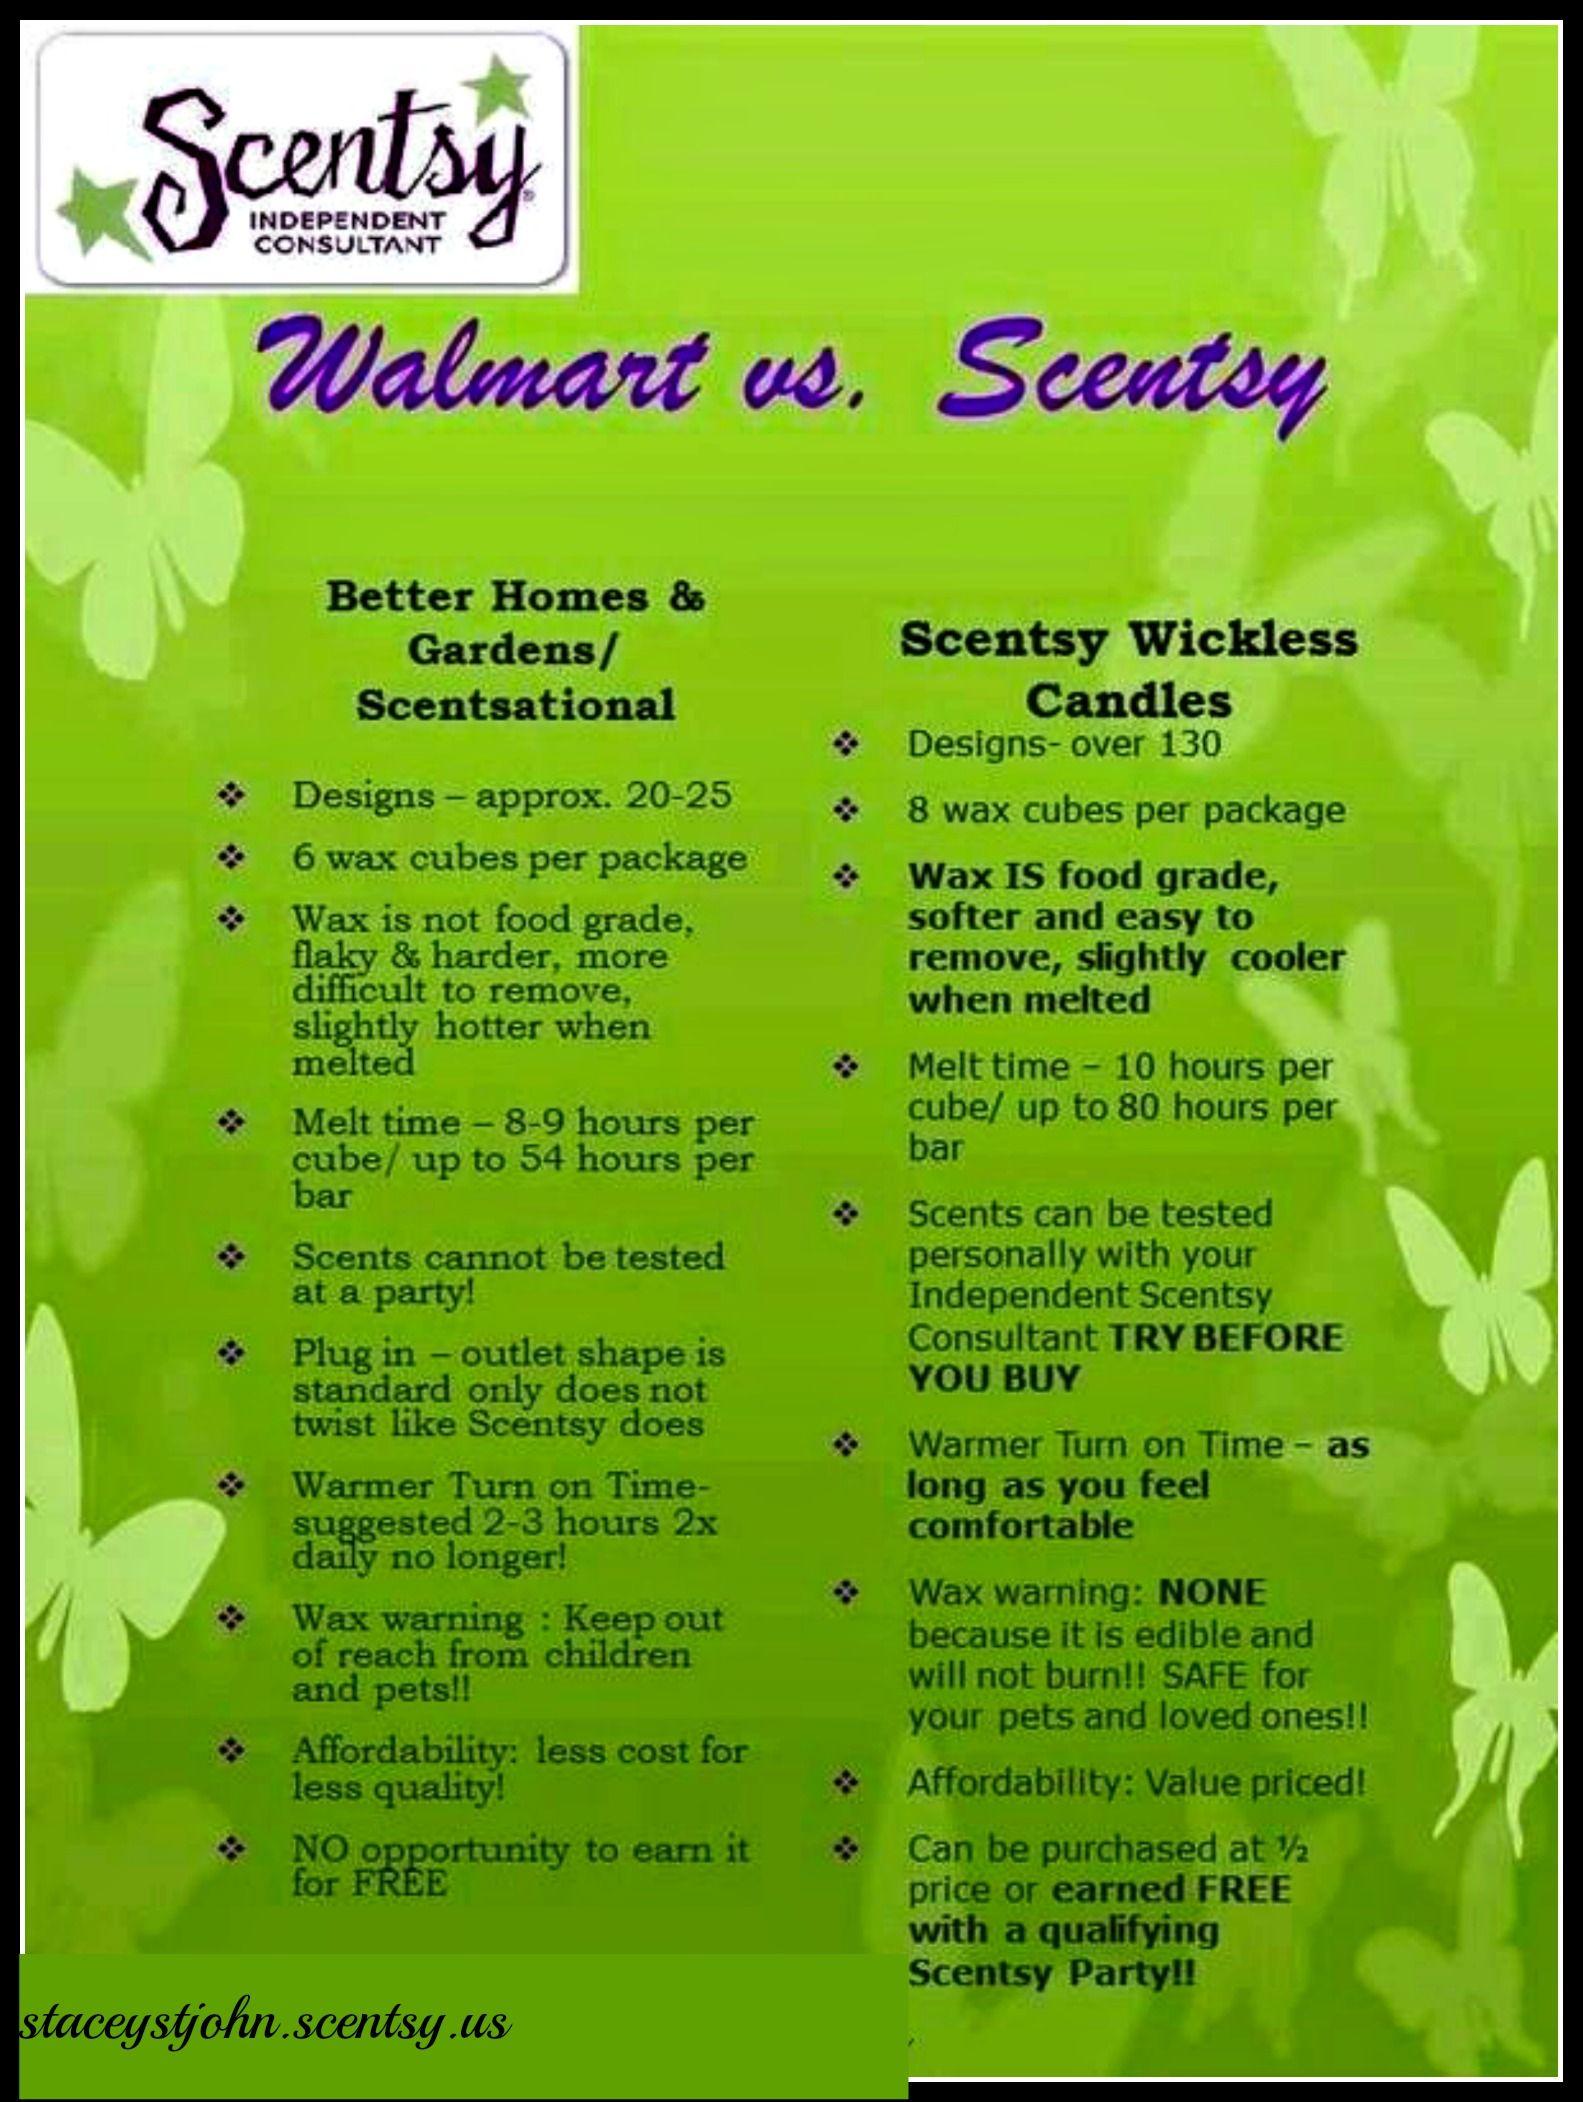 bca1b12e66682027ddcefa984899962c - Better Homes And Gardens Wax Warmer Vs Scentsy